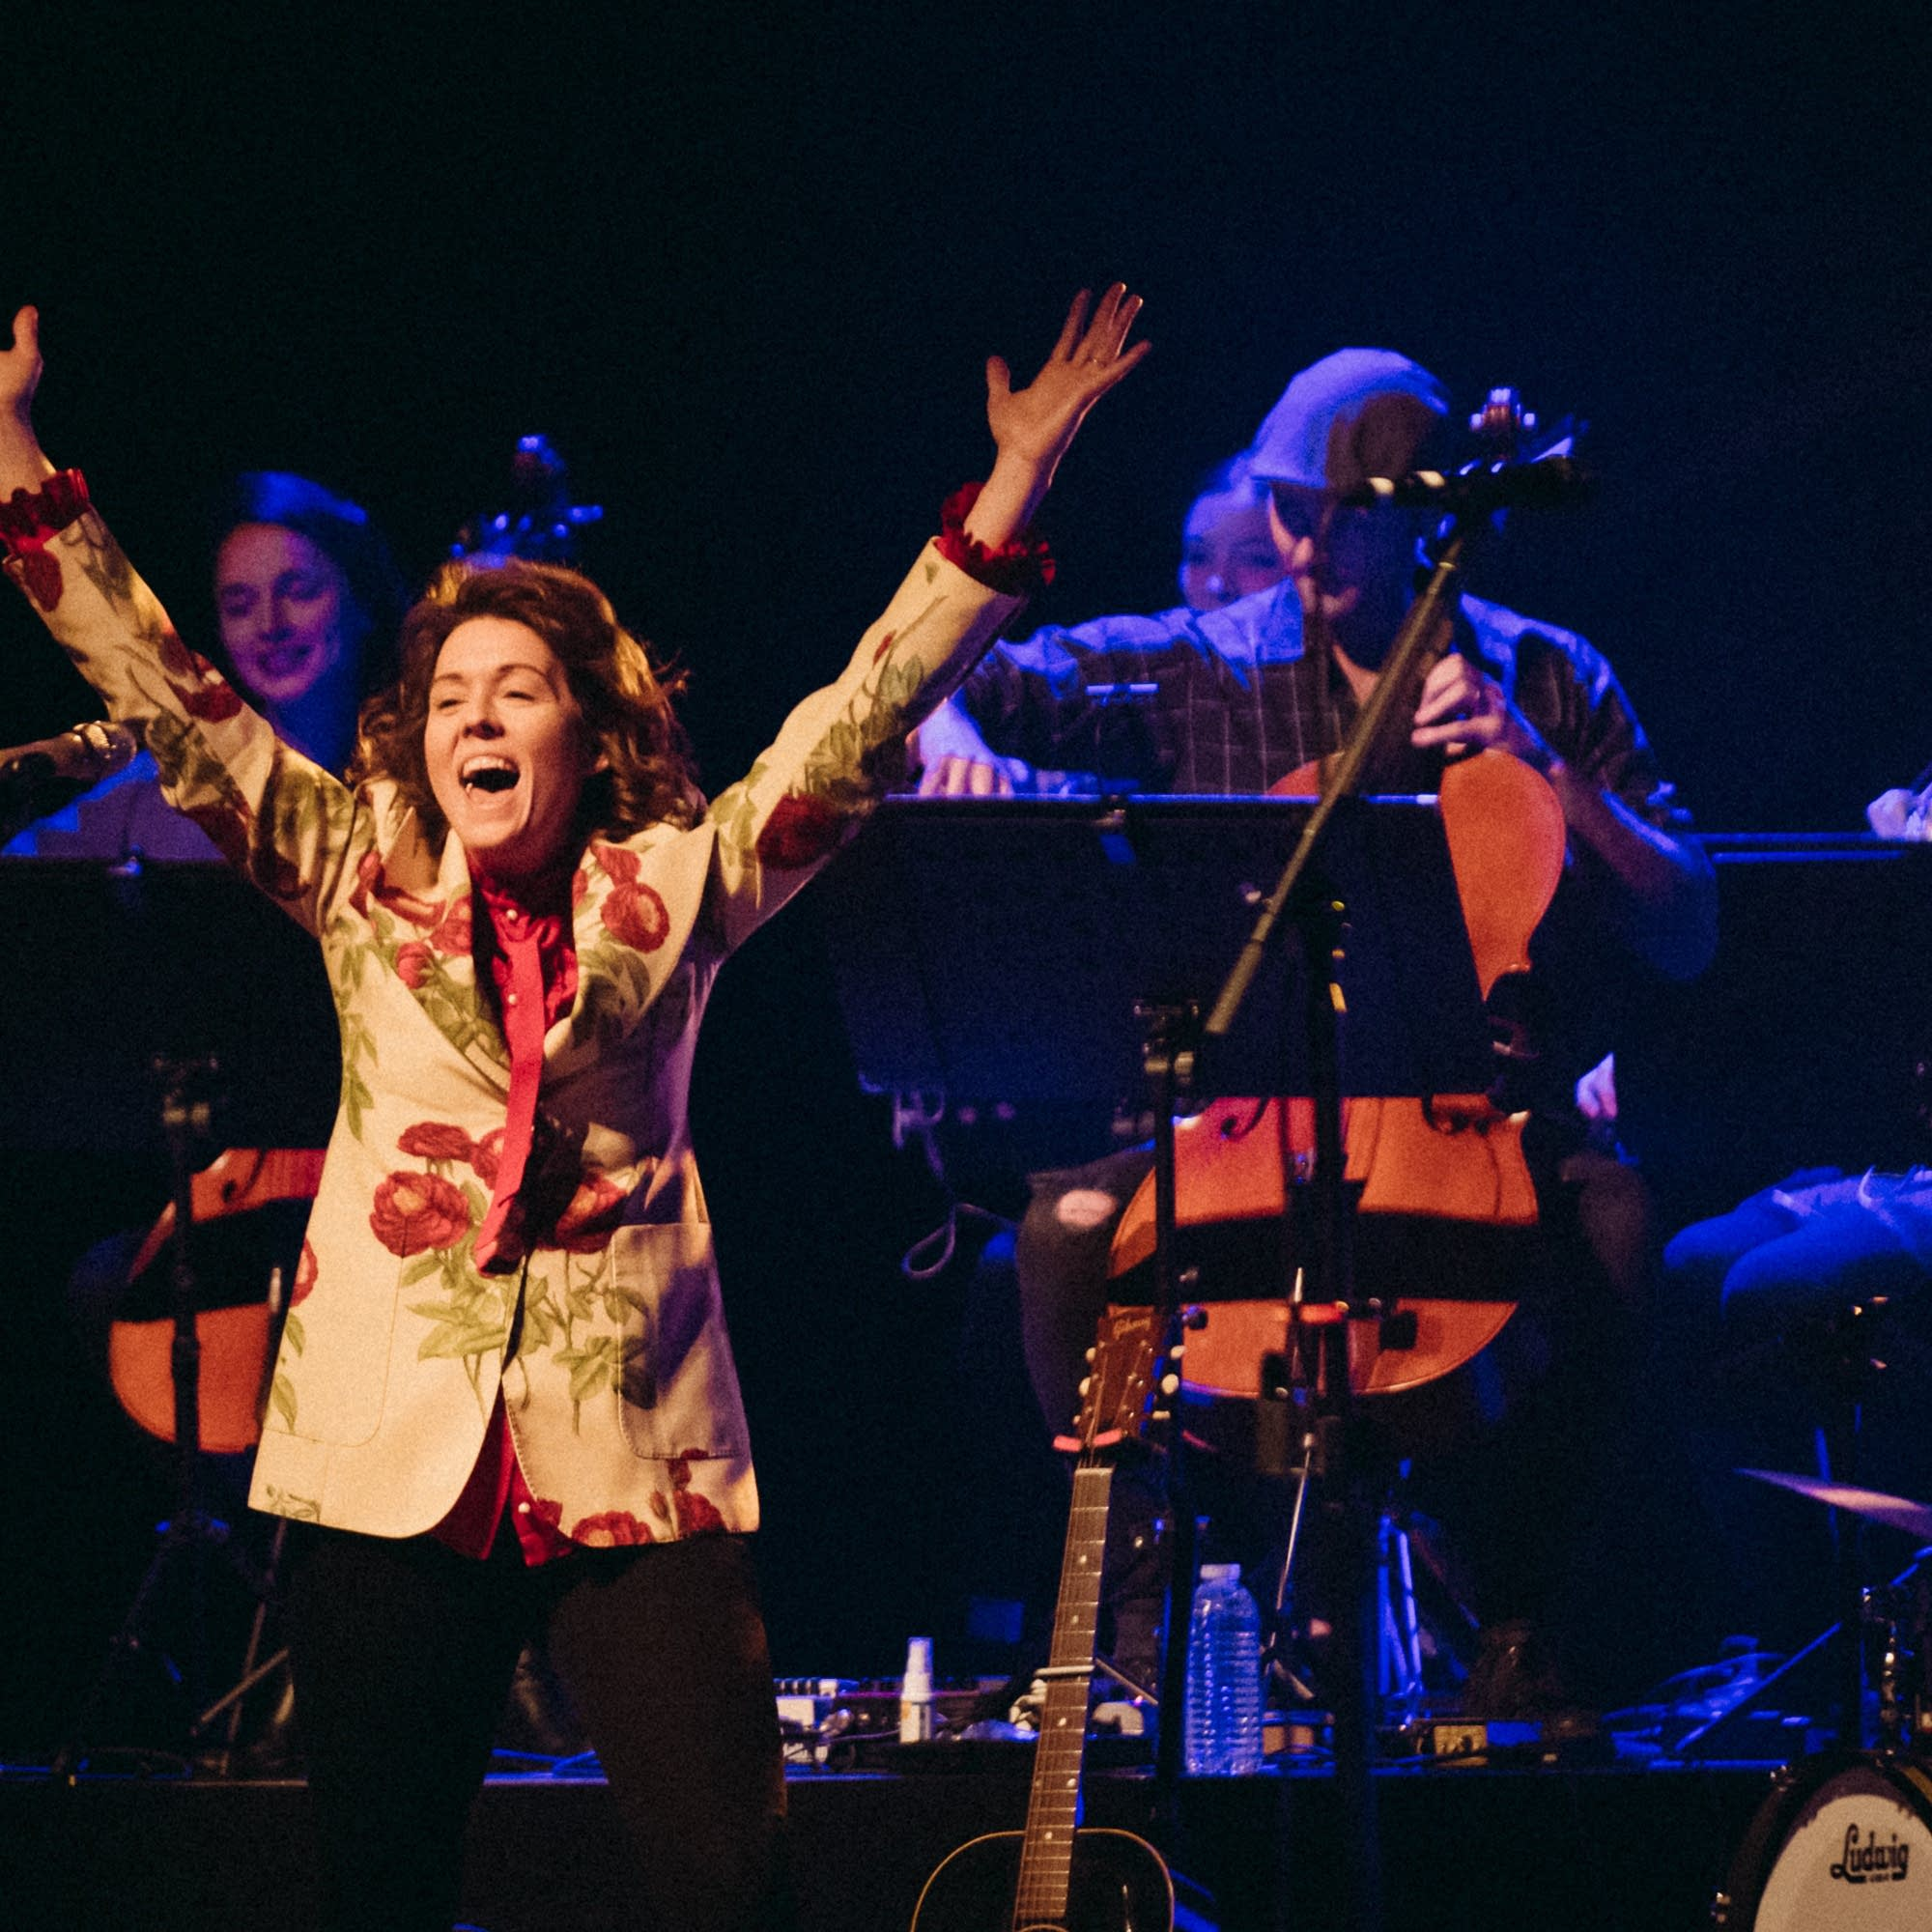 Brandi Carlile in concert at the State Theatre in Minneapolis.